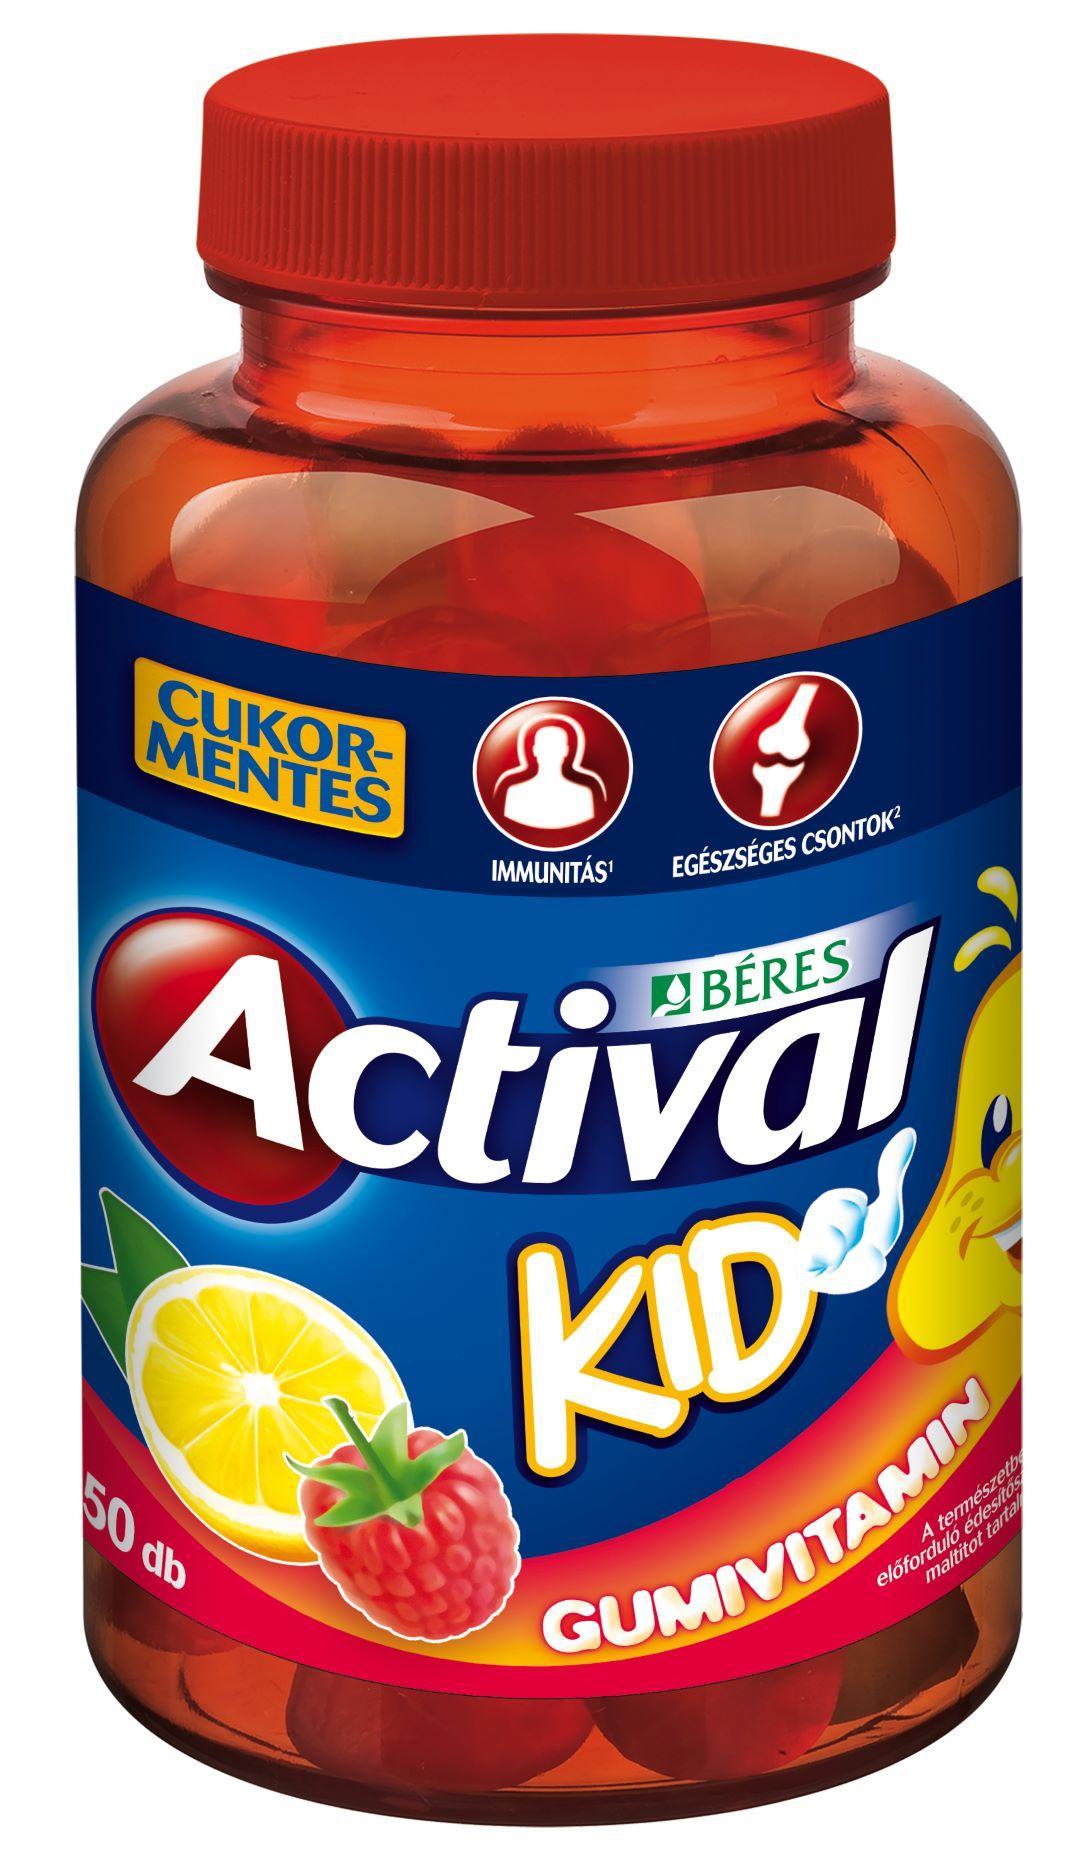 Actival Kid gumivitamin 50x